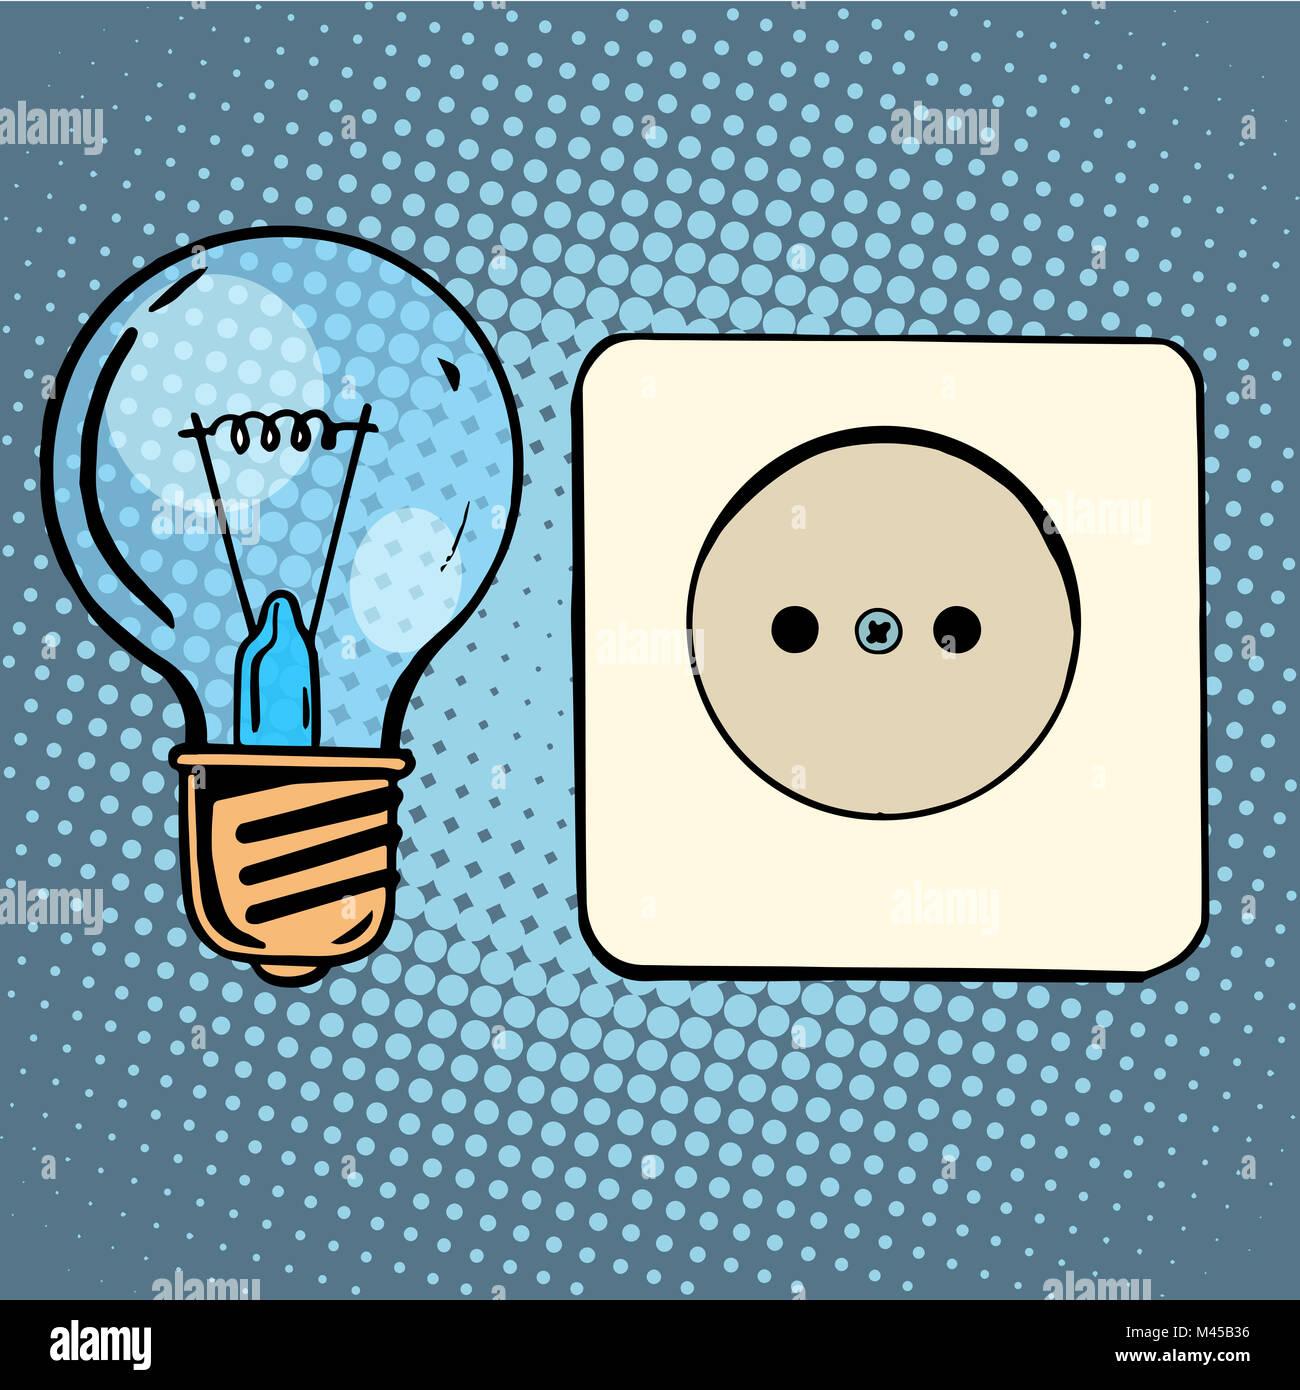 Light Bulb Socket Stock Photos & Light Bulb Socket Stock Images - Alamy